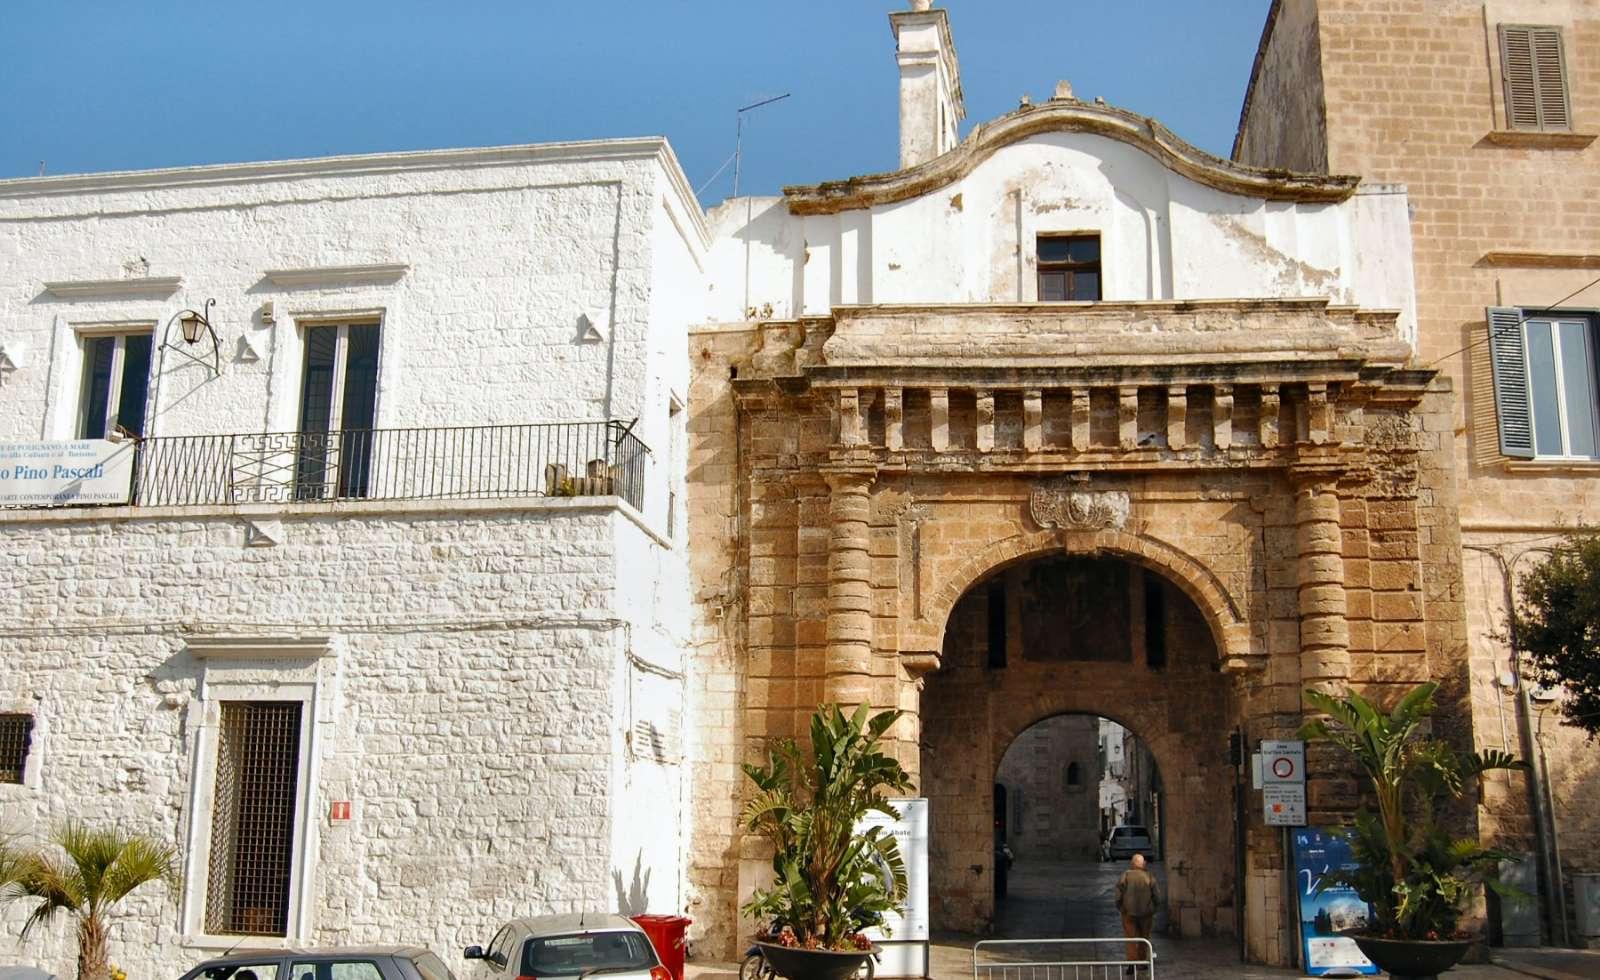 Das Tor der Altstadt